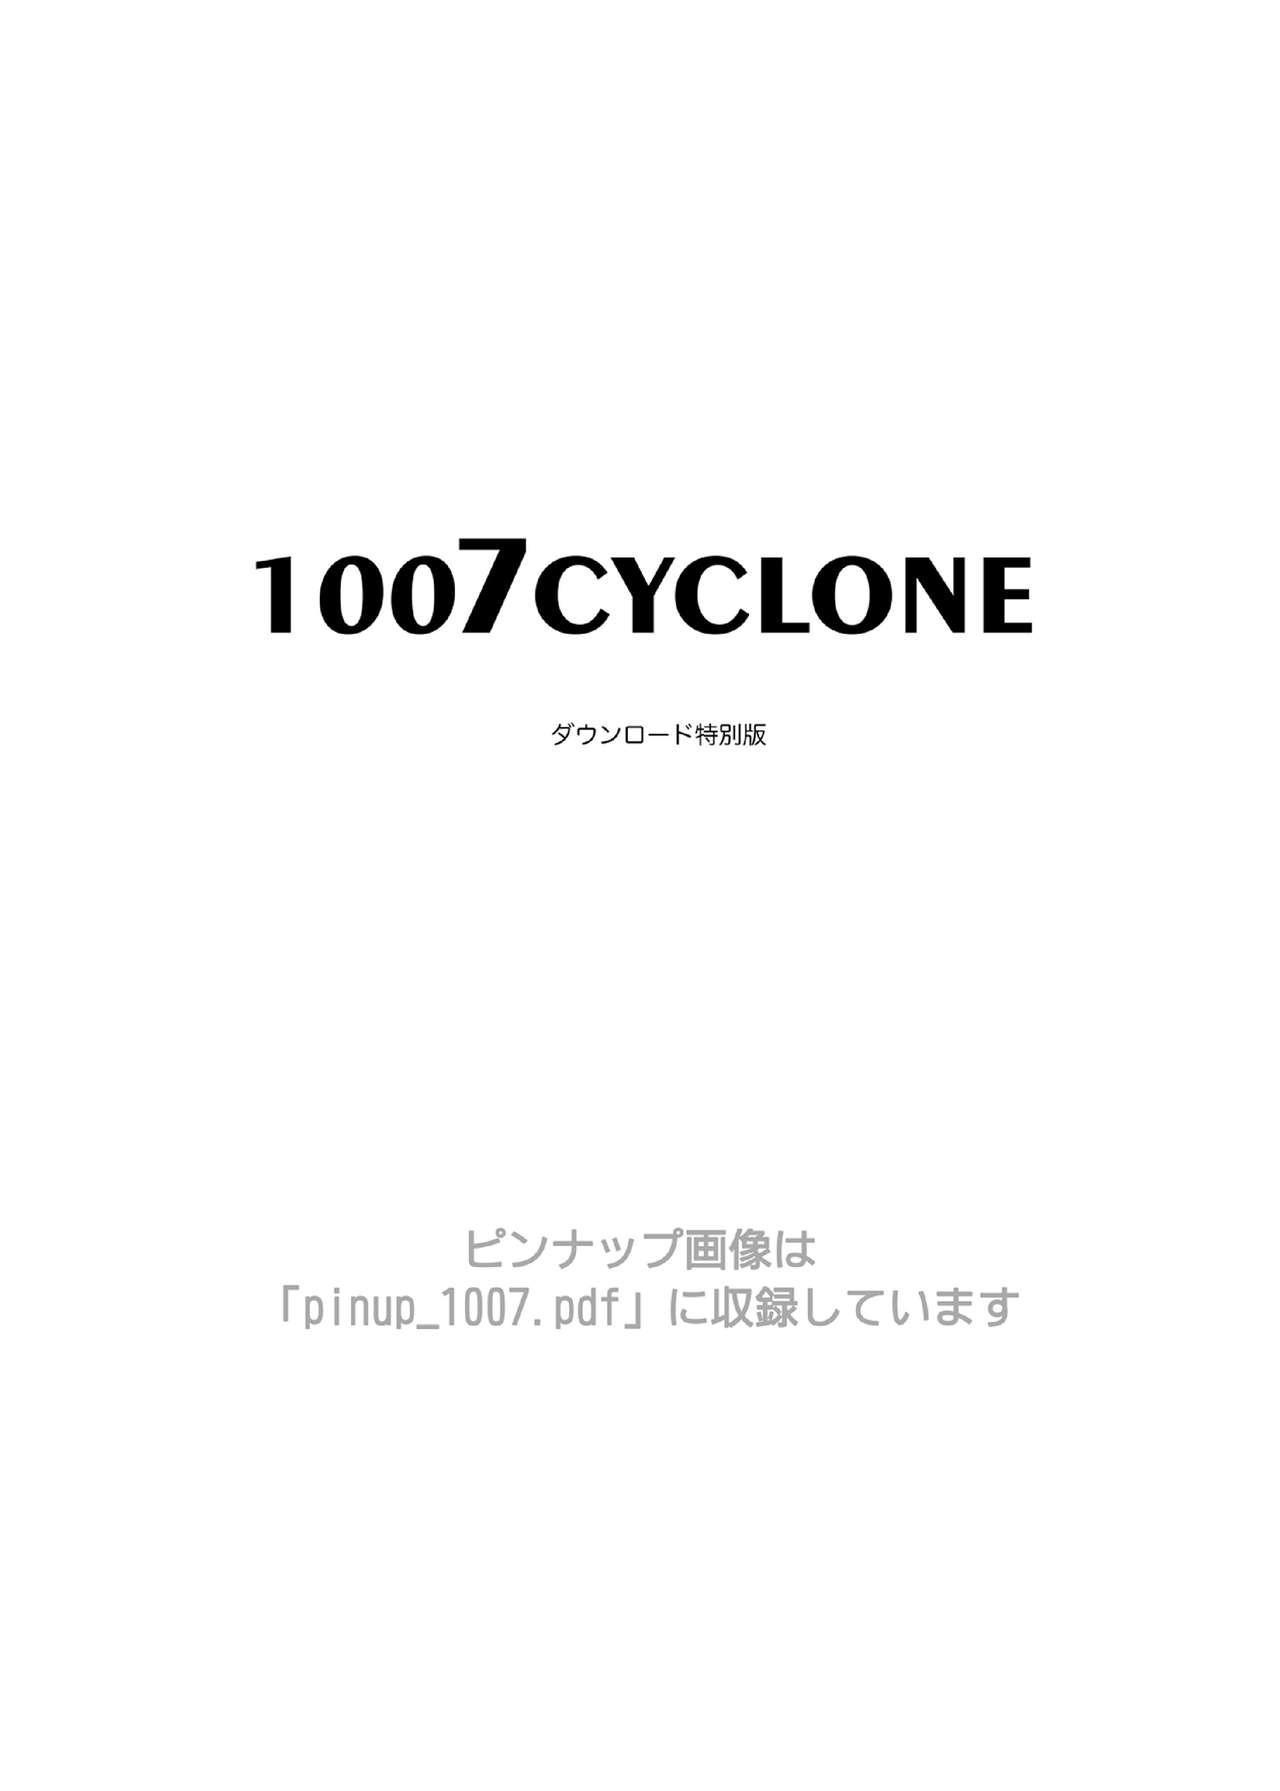 1007CYCLONE 1